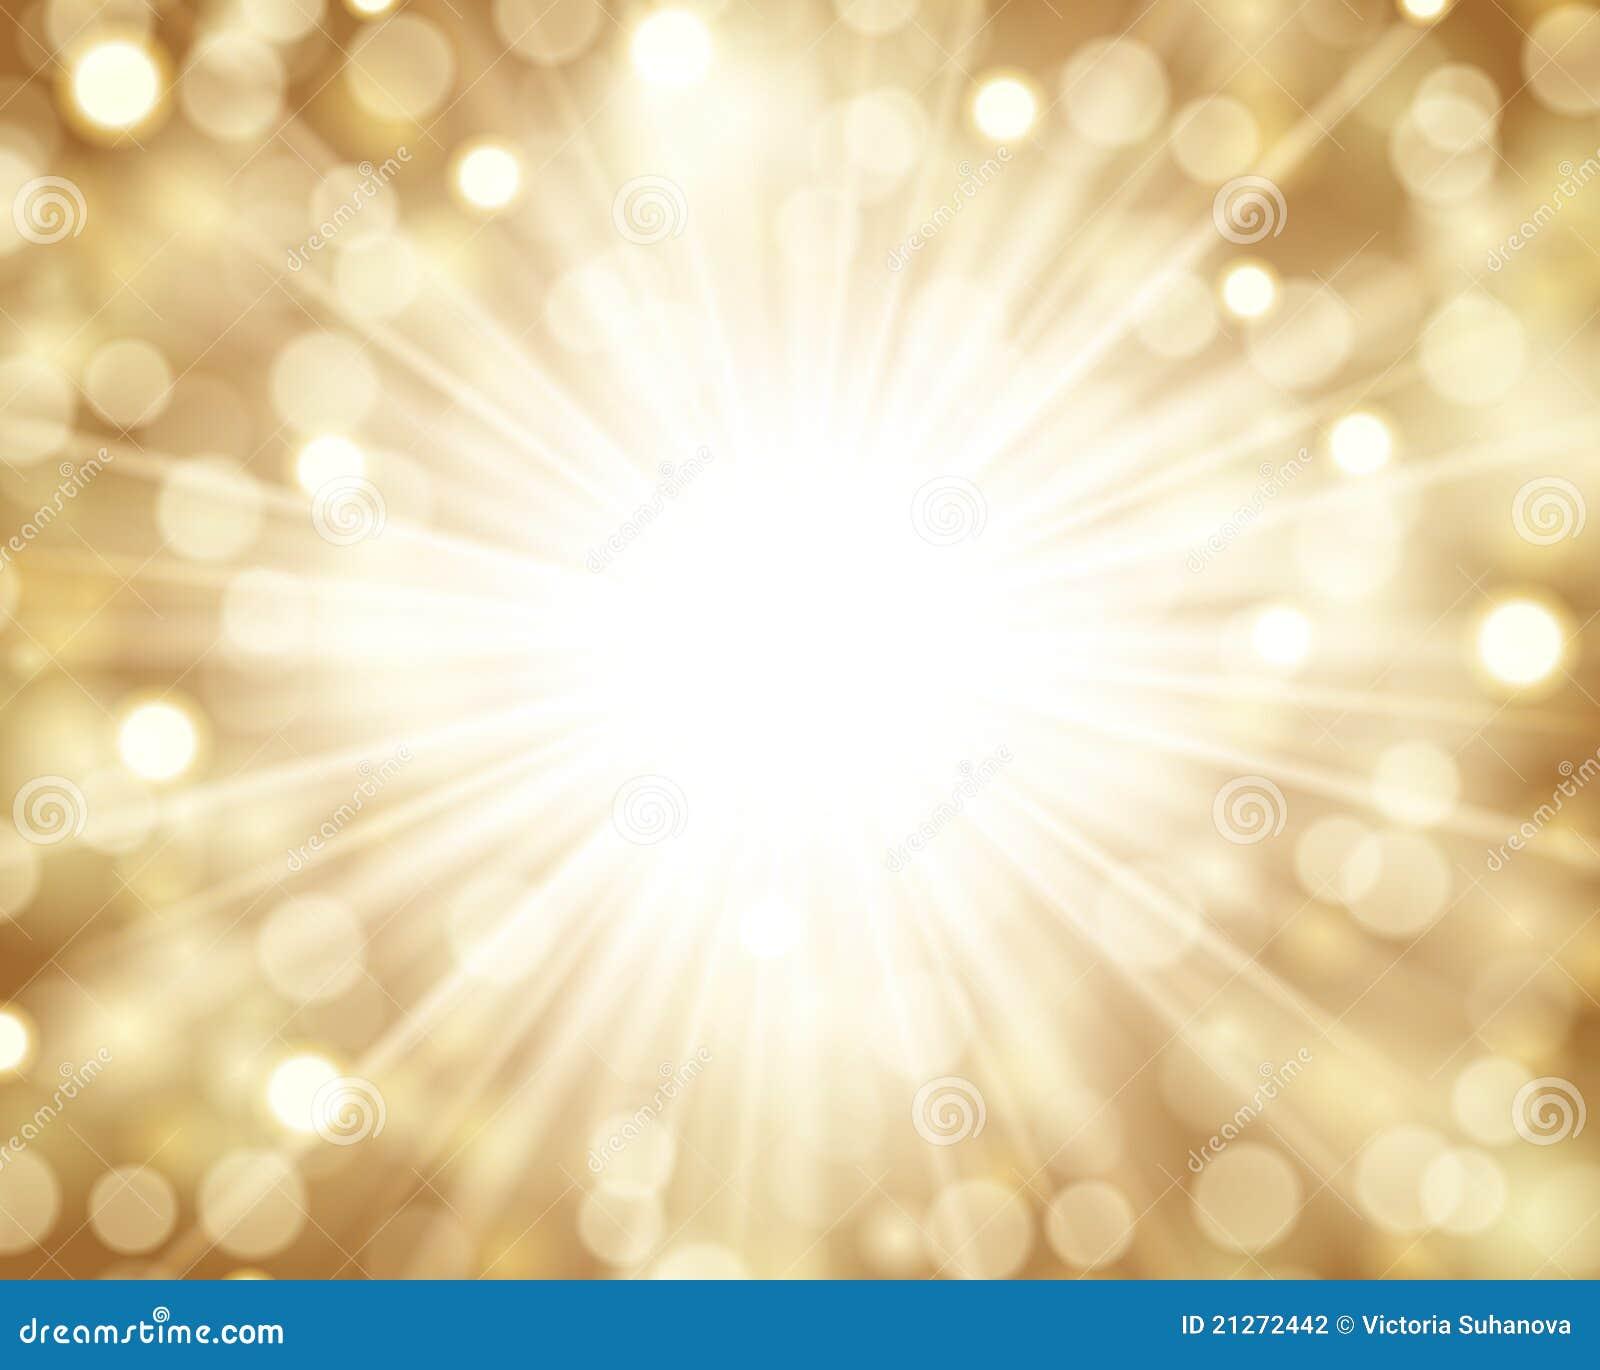 sparkling light background stock illustration illustration of